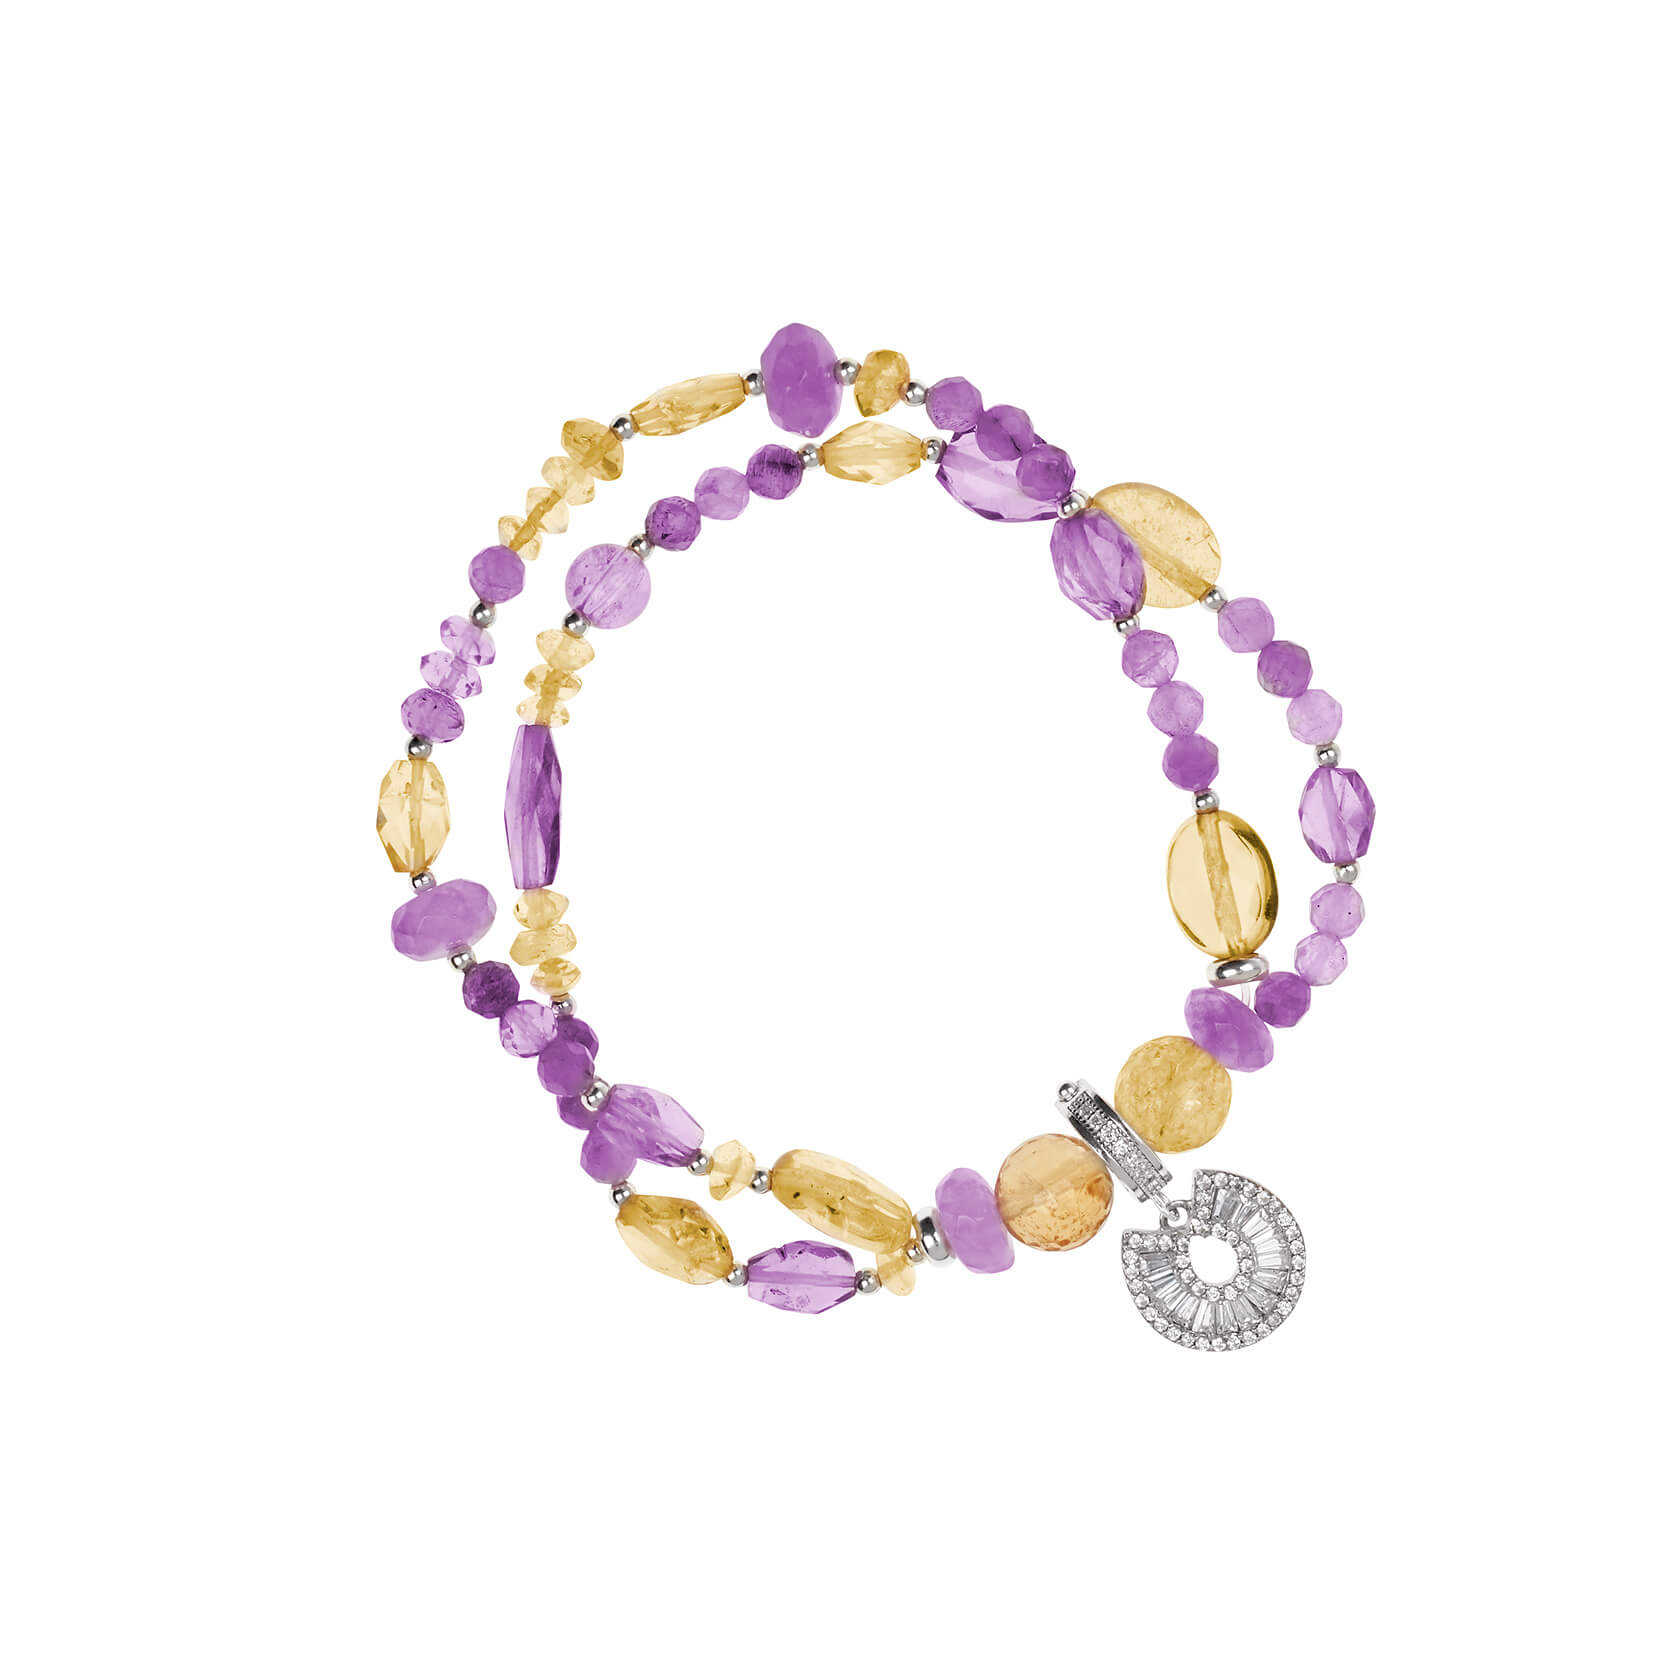 Citrine and amethyst double bracelet Marybola